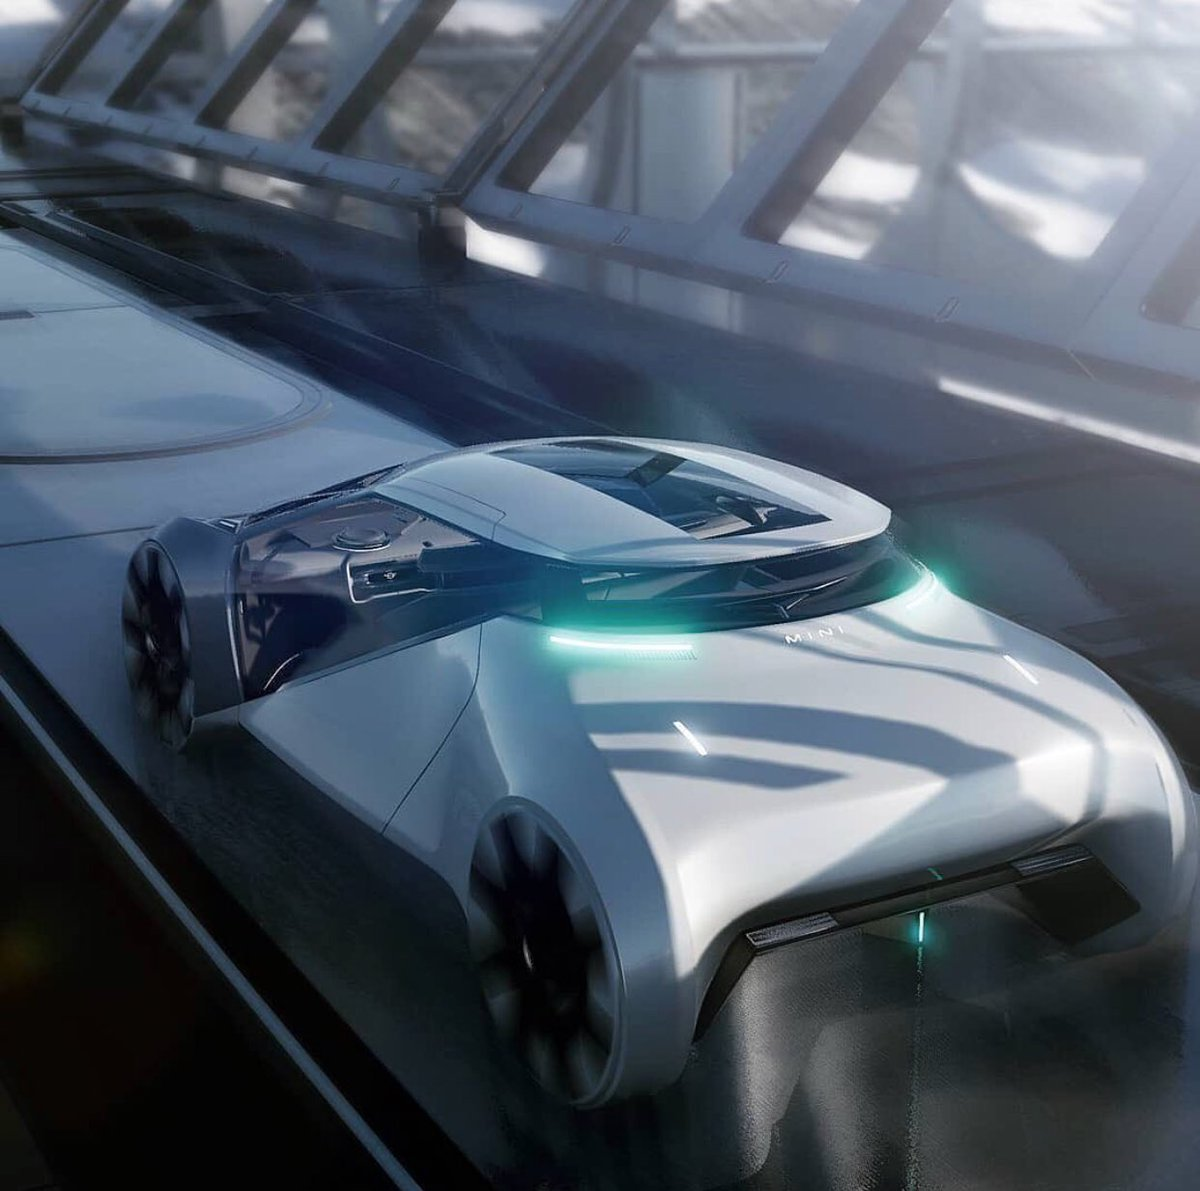 Domain Available @Undeveloped   http://FuturisticEV.com Includes: http://FuturisticEVs.com  #Futuristic #EV #eCars #Tesla #Ford #Ecar #future #Domain #Toyotaqq pic.twitter.com/22q7q8wKQL